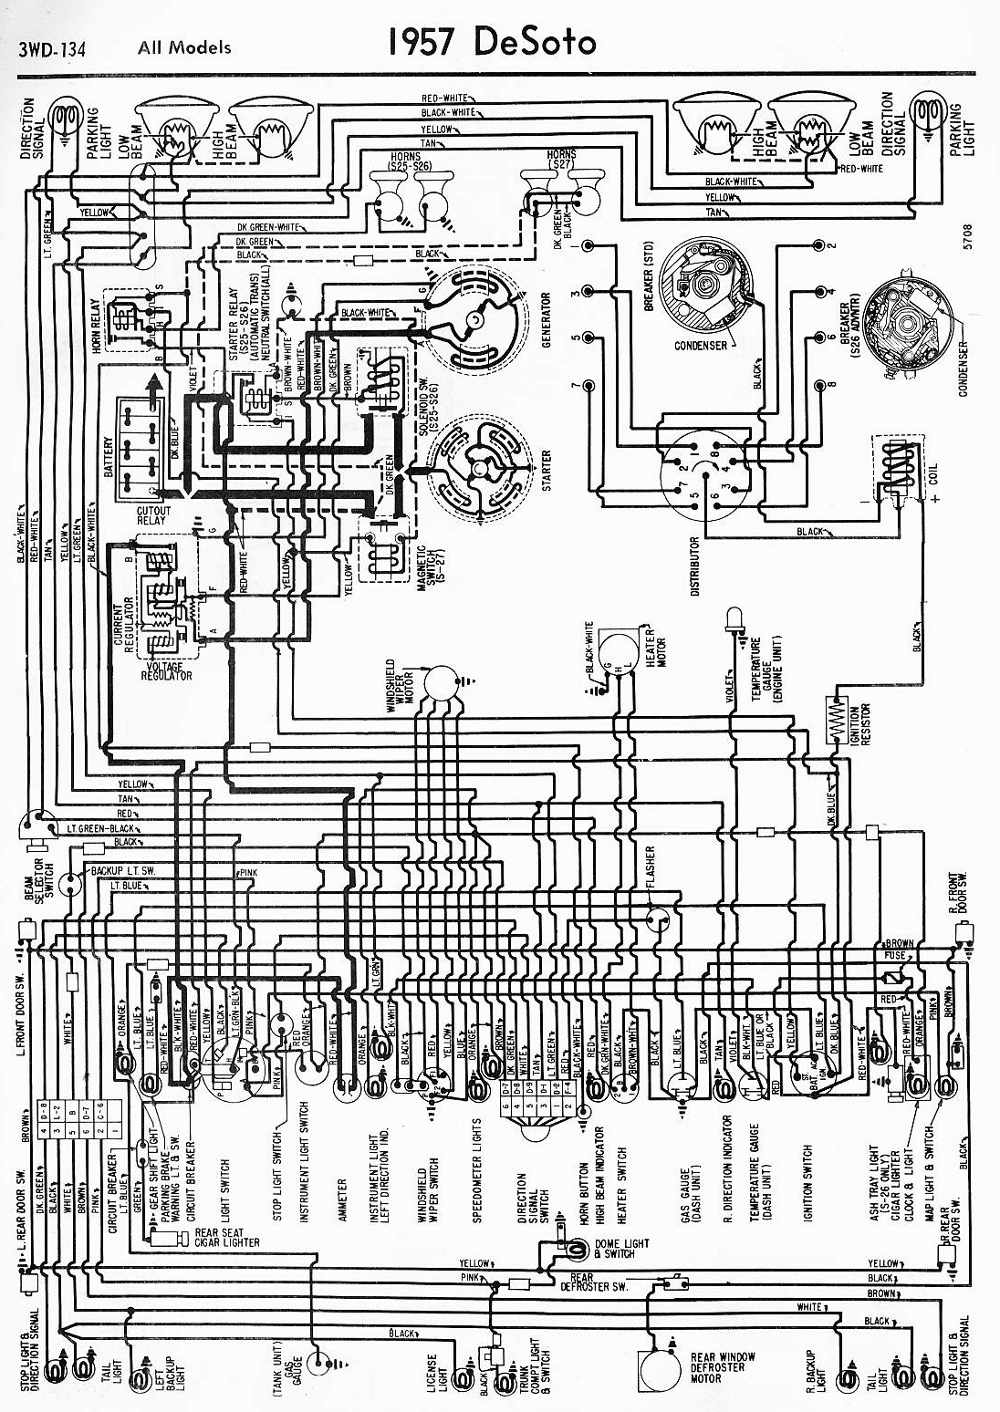 1959 desoto wiring diagram wiring diagram g11 1960 desoto wiring diagram get wiring